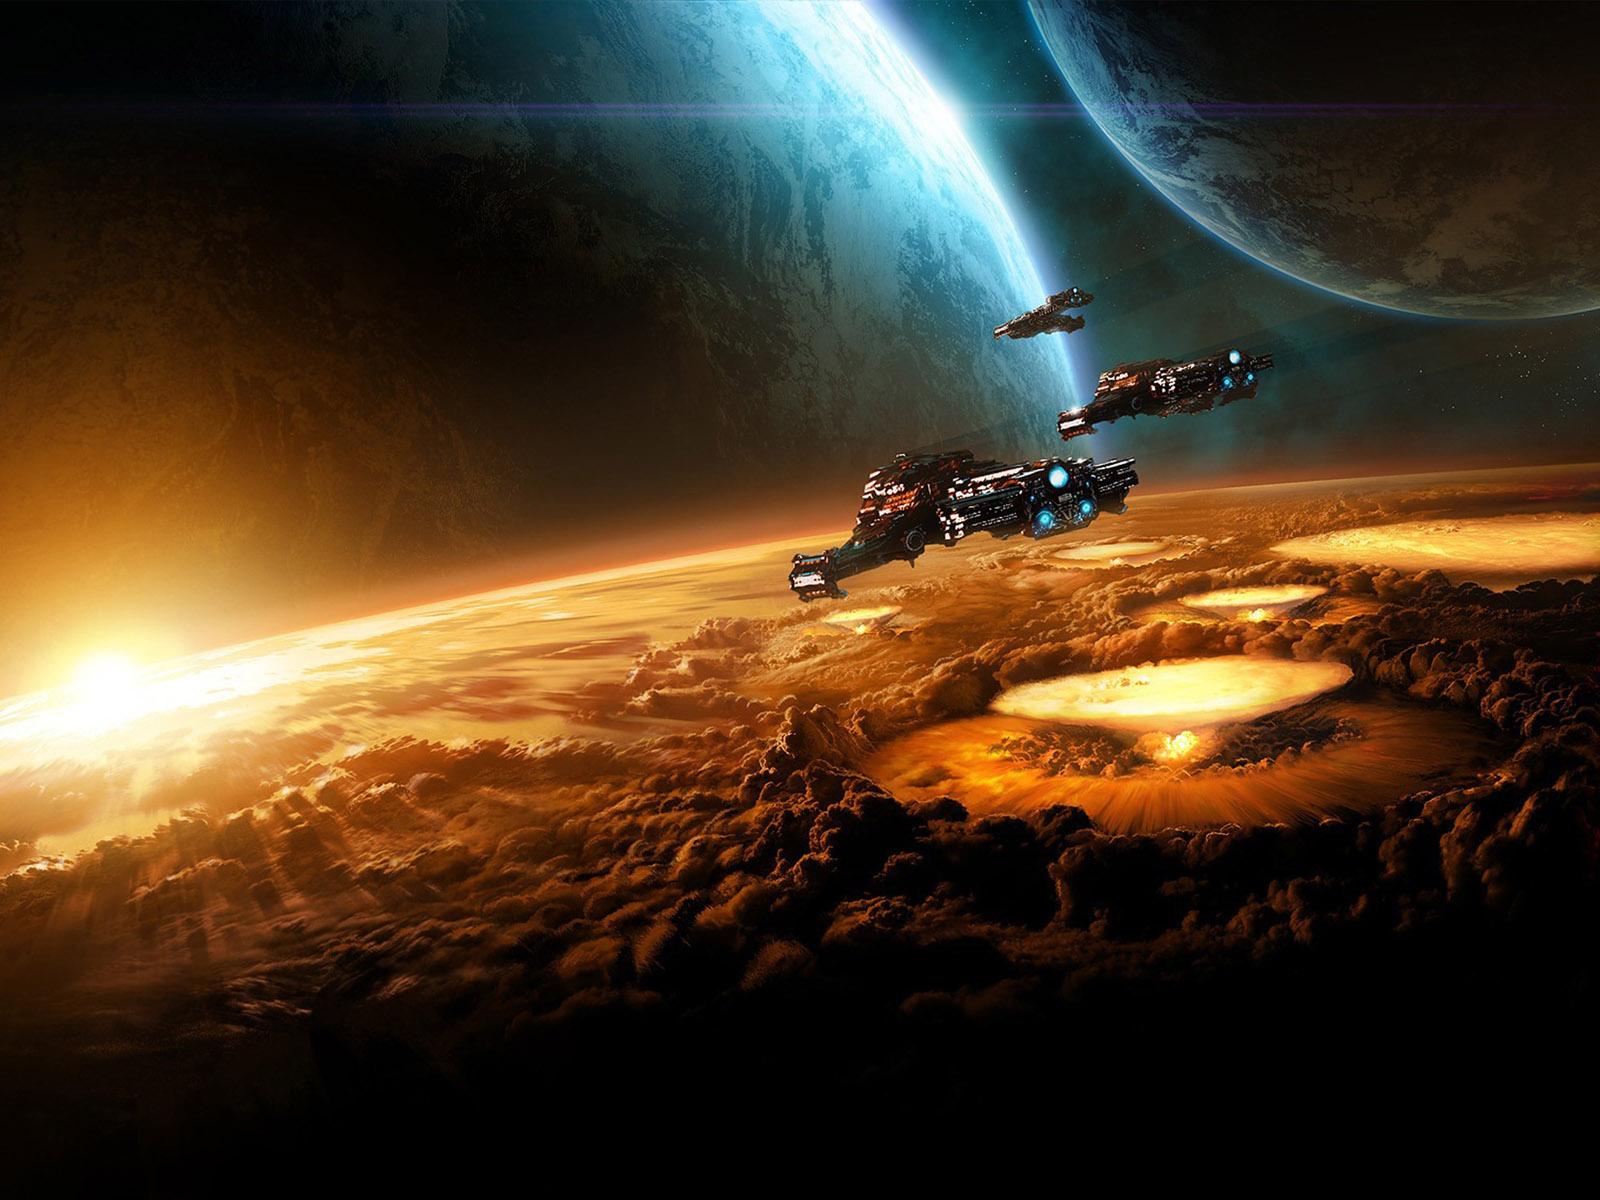 rise Science Fiction Sci fi Wallpaper Num 57 1600 x 1200 3231 Kb 1600x1200